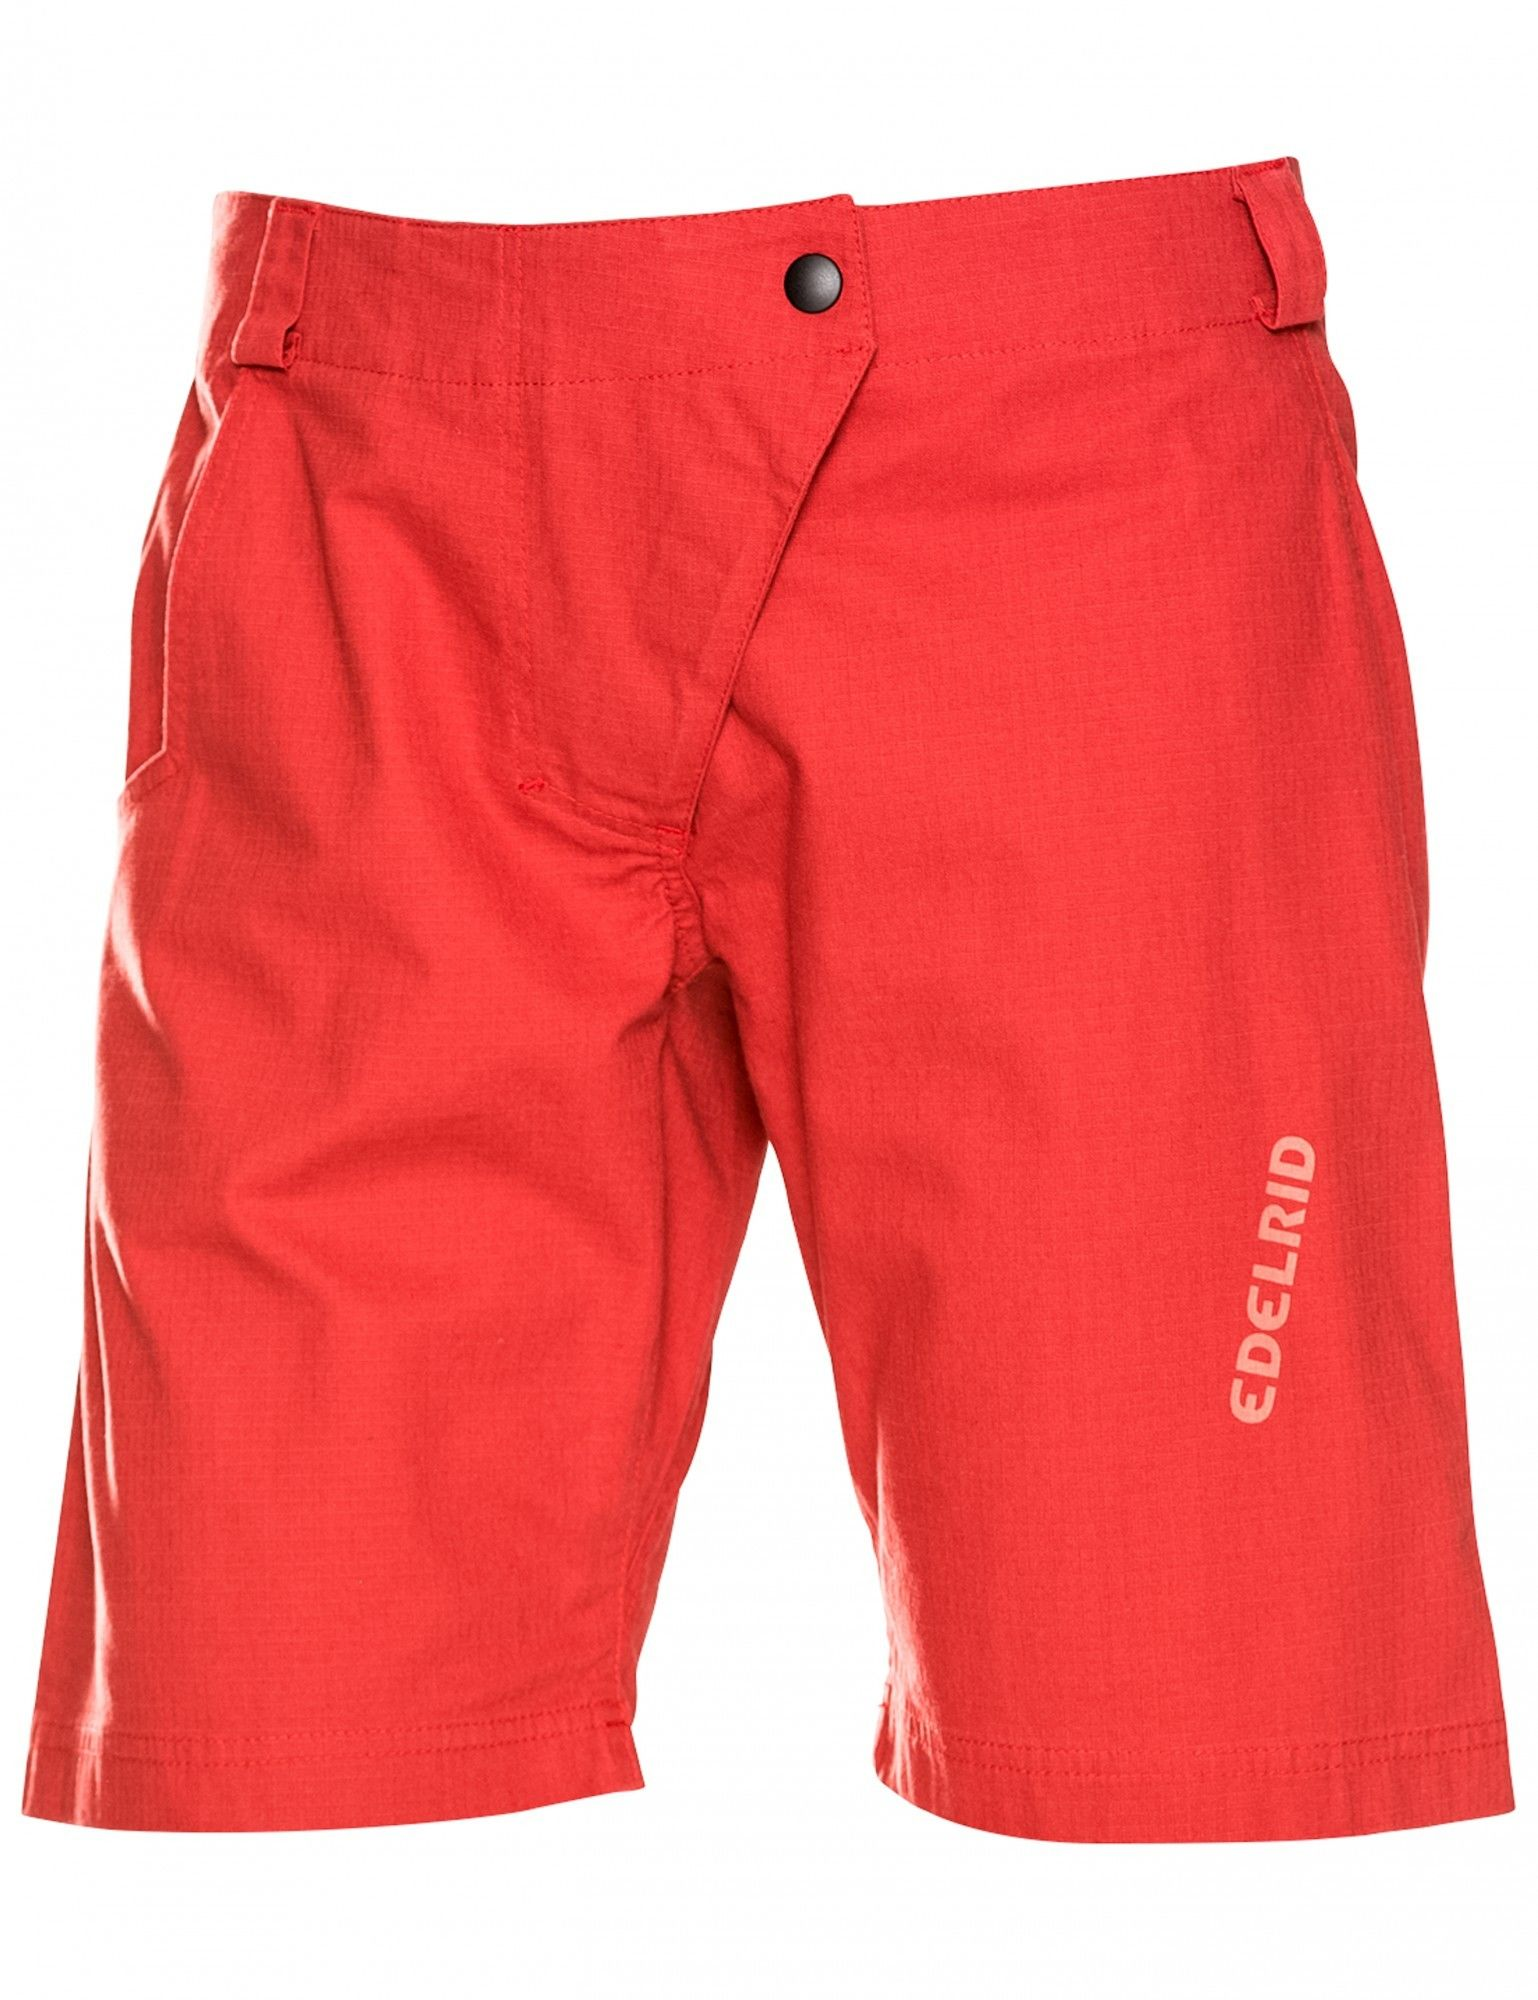 Edelrid Rope Rider Shorts Rot, Female Shorts, S -36